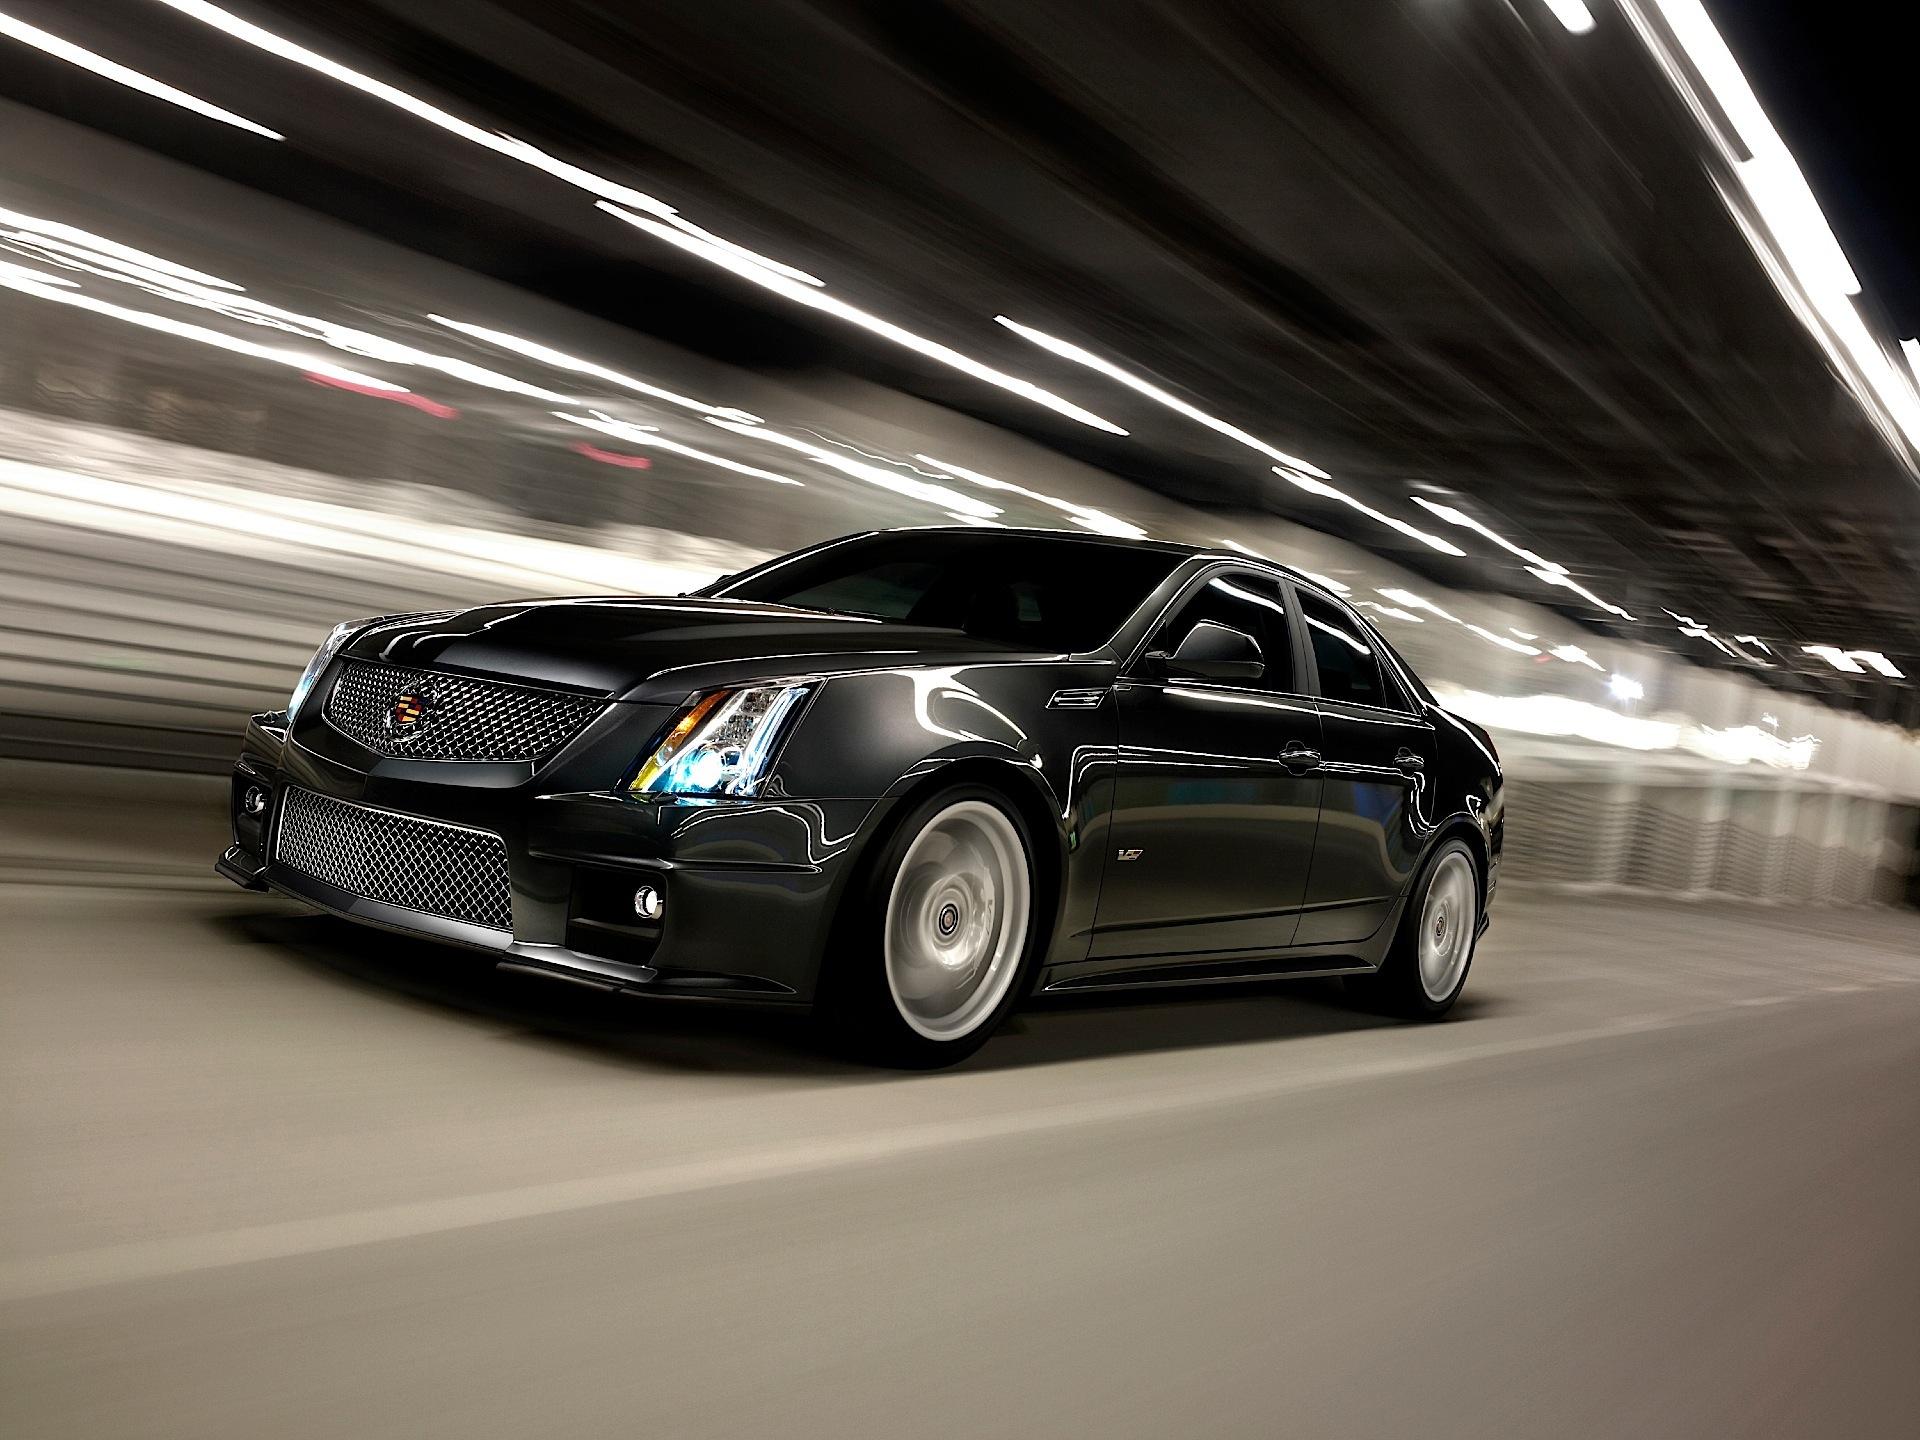 2013 Cadillac Cts V Specs New Car Update 2019 2020